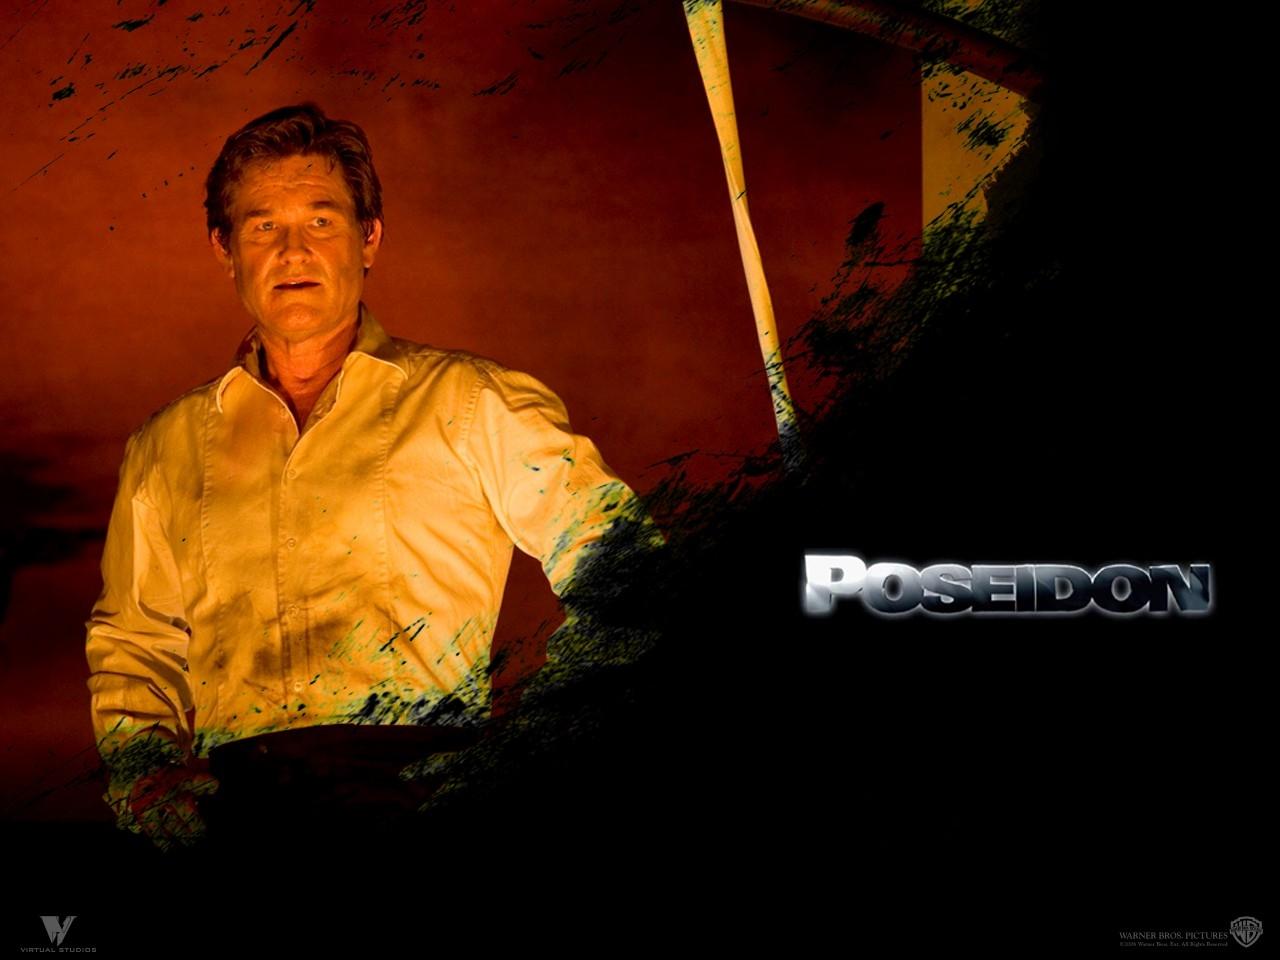 Wallpaper del film Poseidon, del 2006